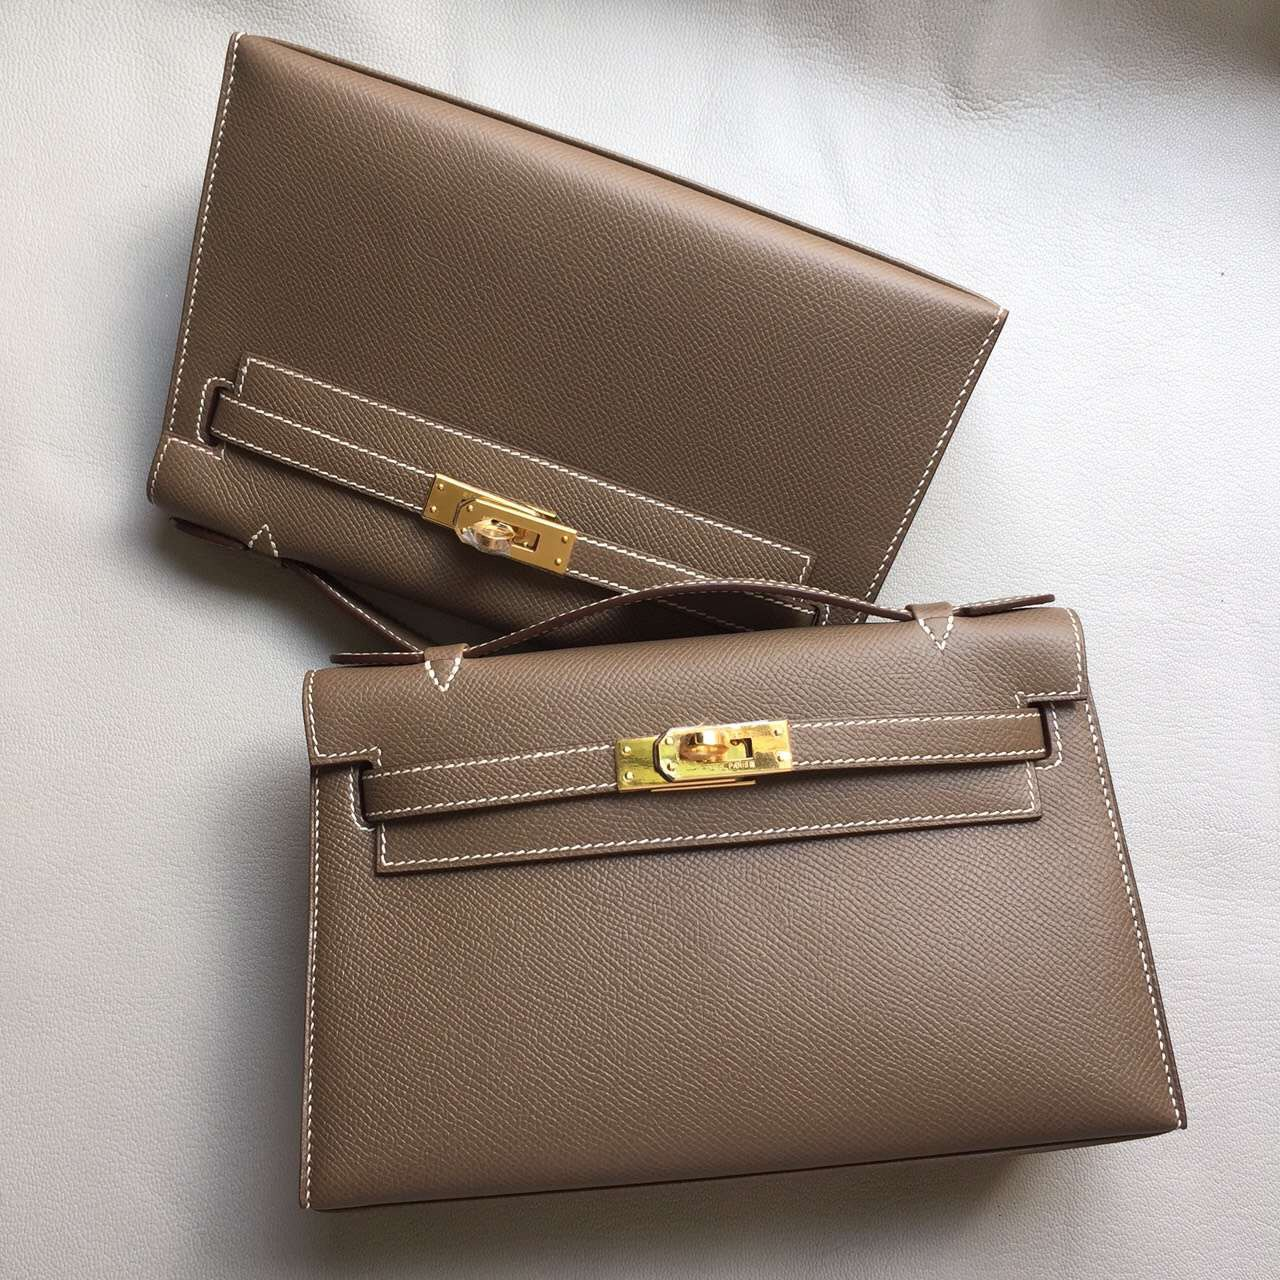 Cheap Hermes Minikelly Pochette Bag 22CM C81 Etoupe Grey Epsom Leather